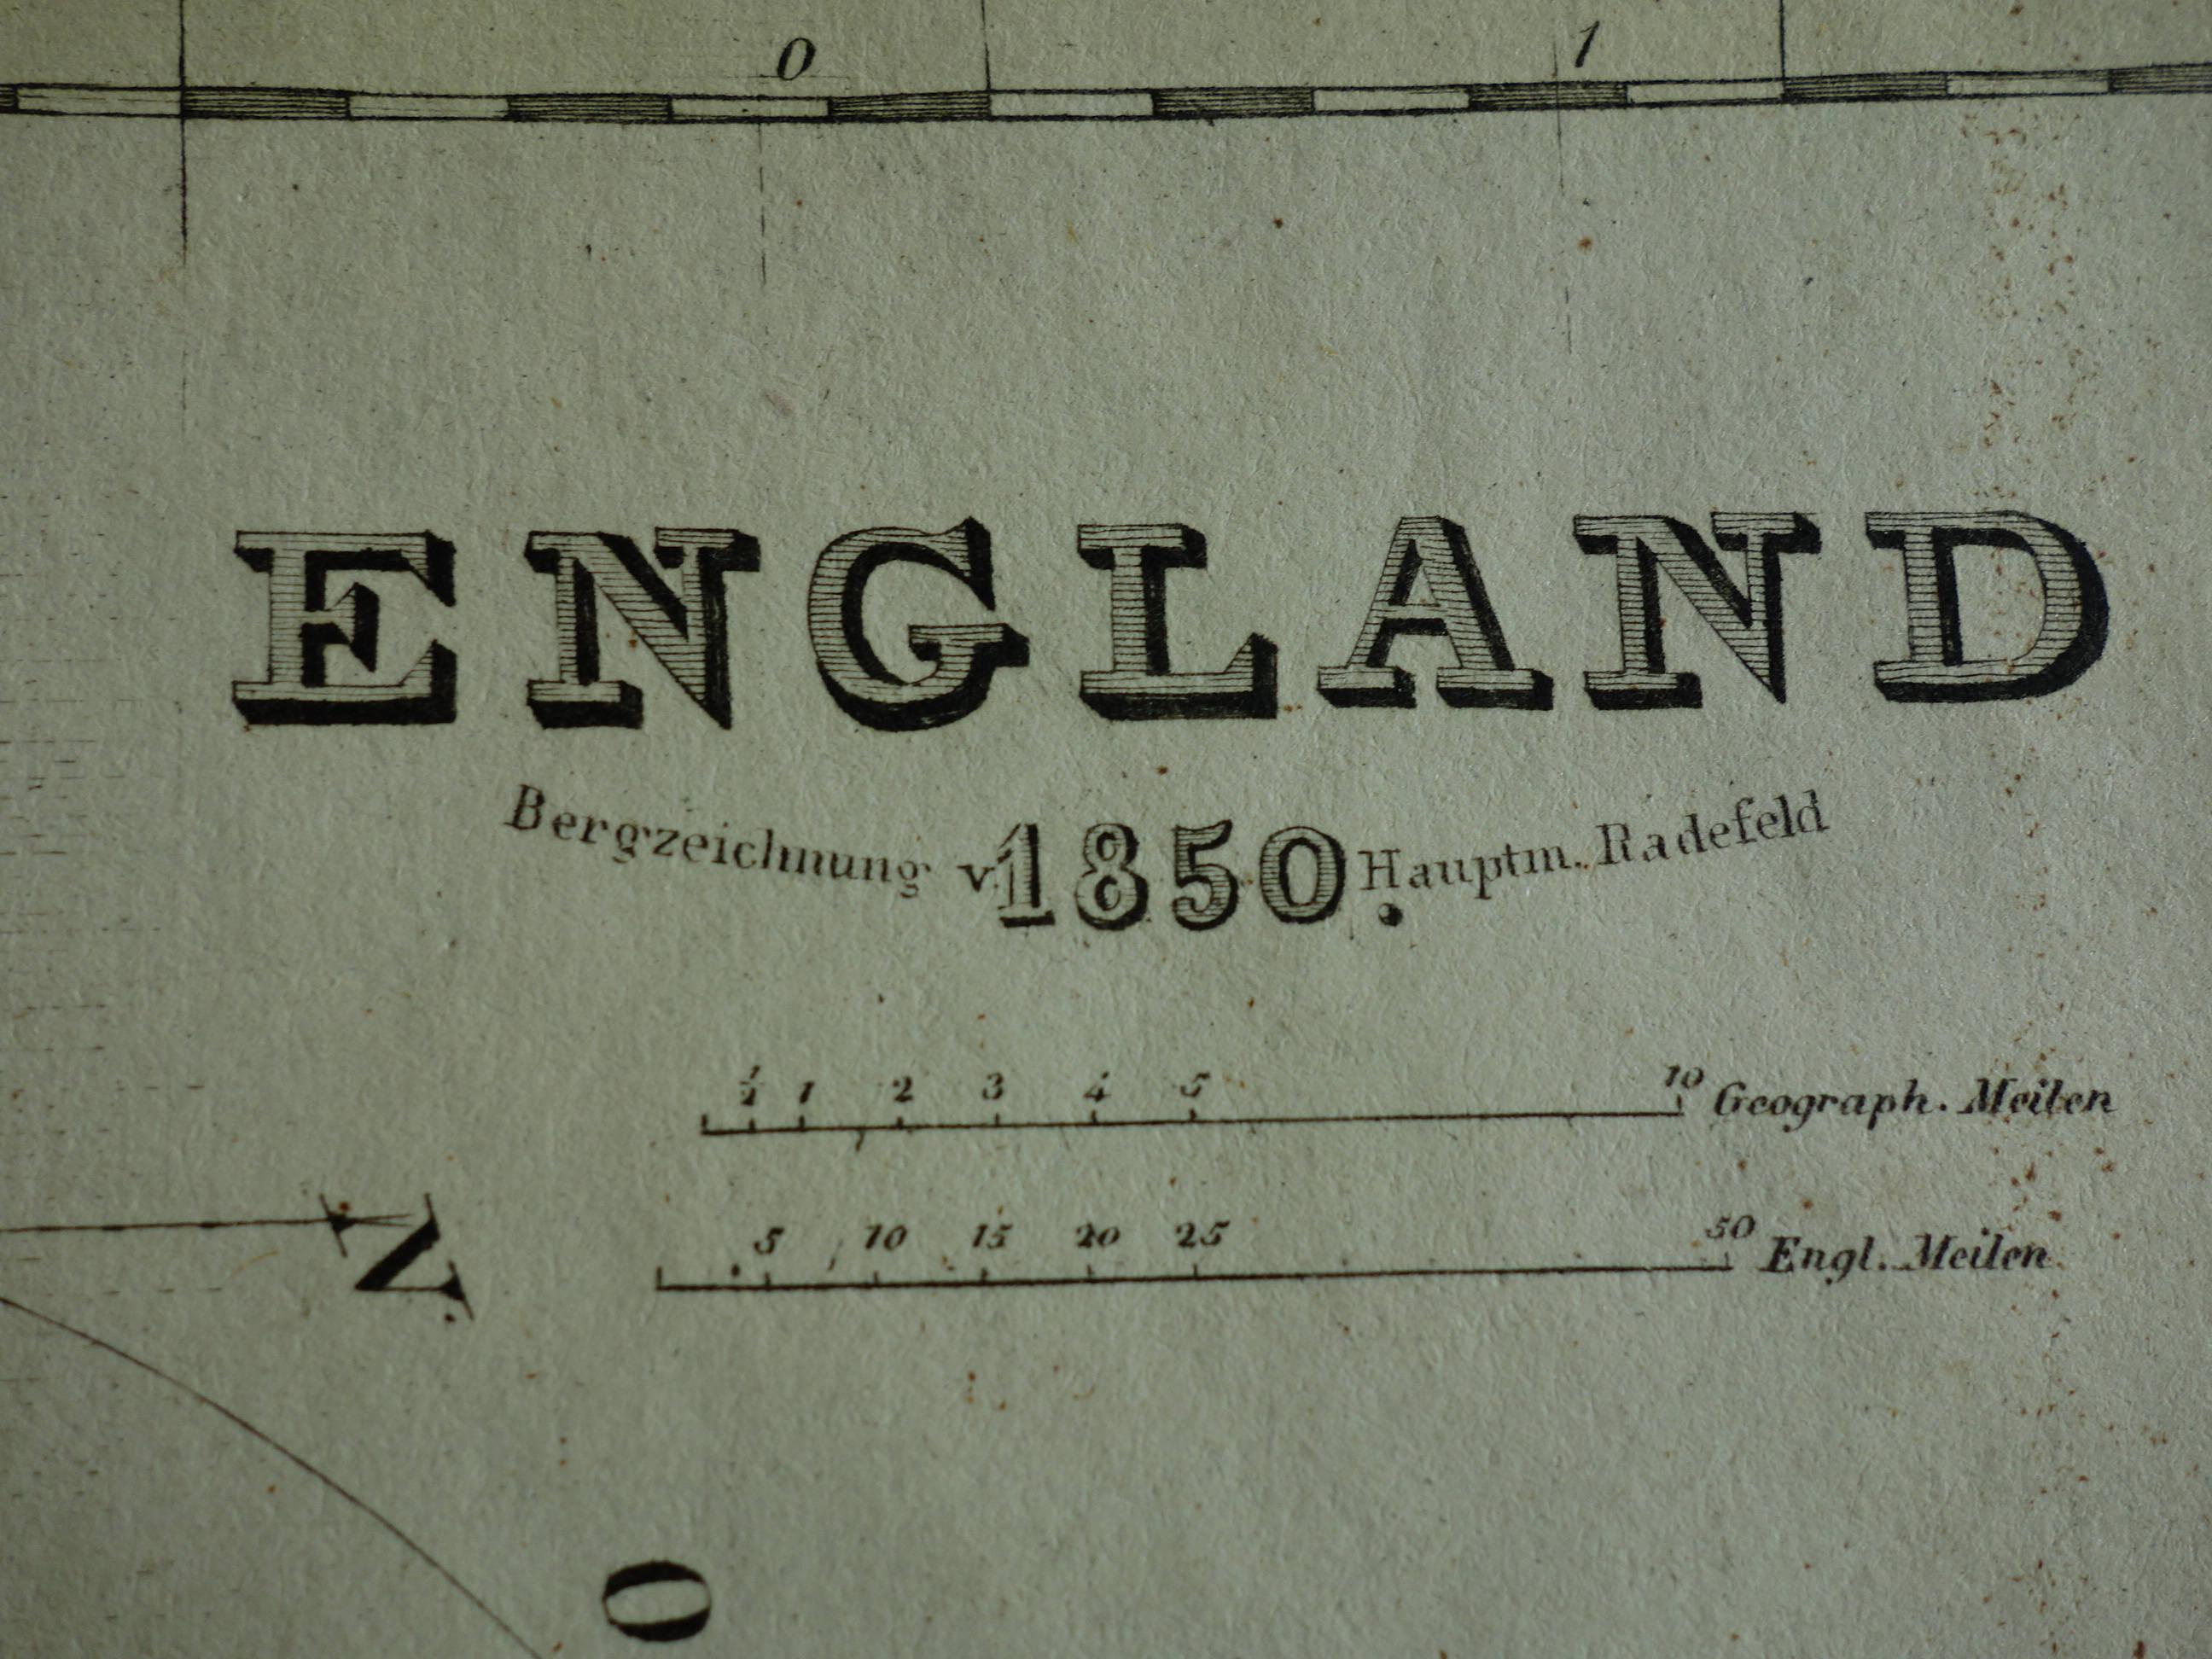 Map Of England 850.England Old Map Of England 1850 Original Hand Colored Antique Print Of Britain Wales London Cornwall Devon Kent Vintage Maps 24x29c 9x11